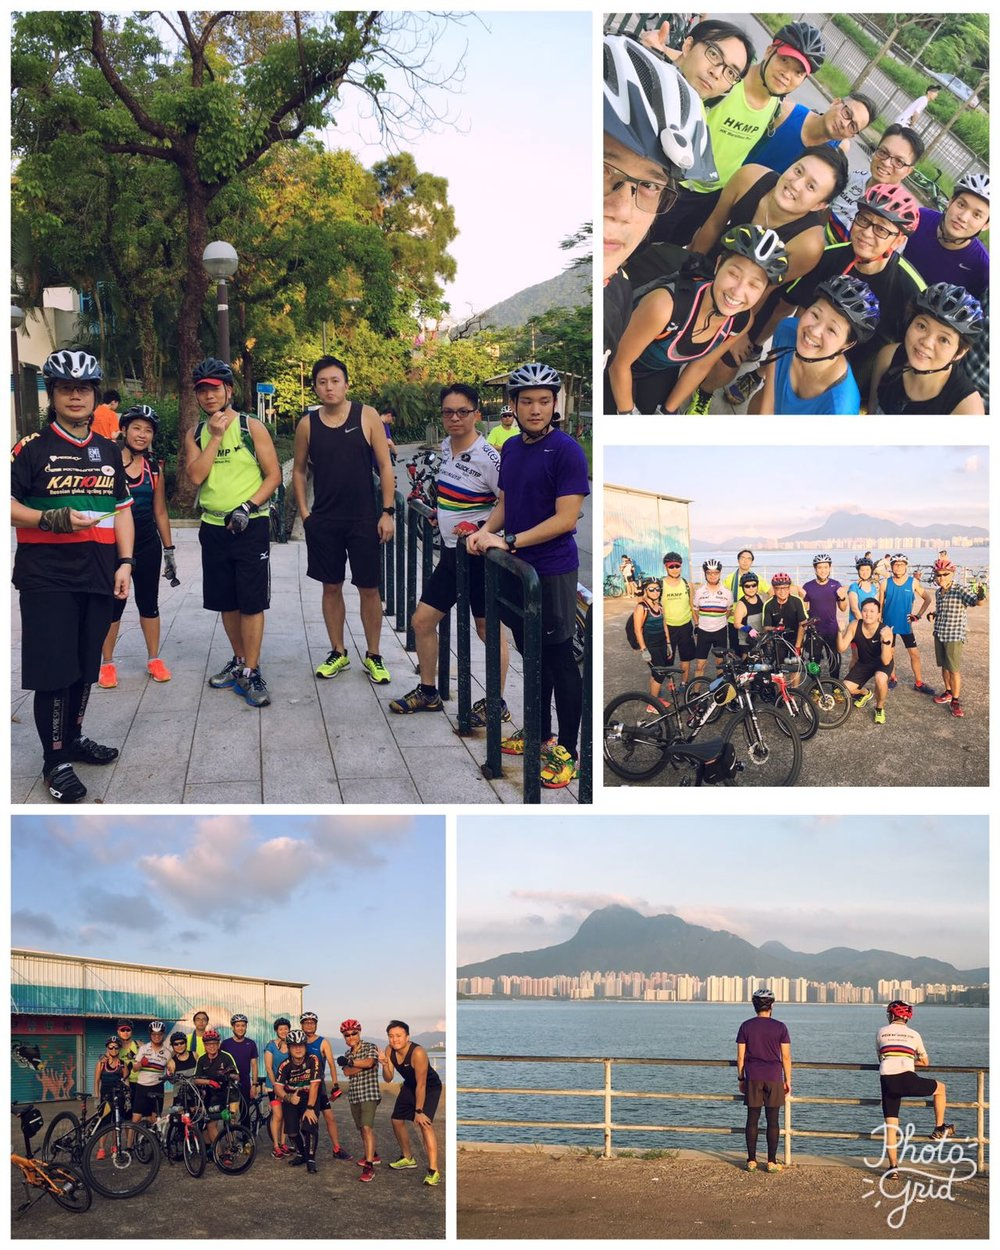 2017-09-01-PHOTO-00006260.jpg